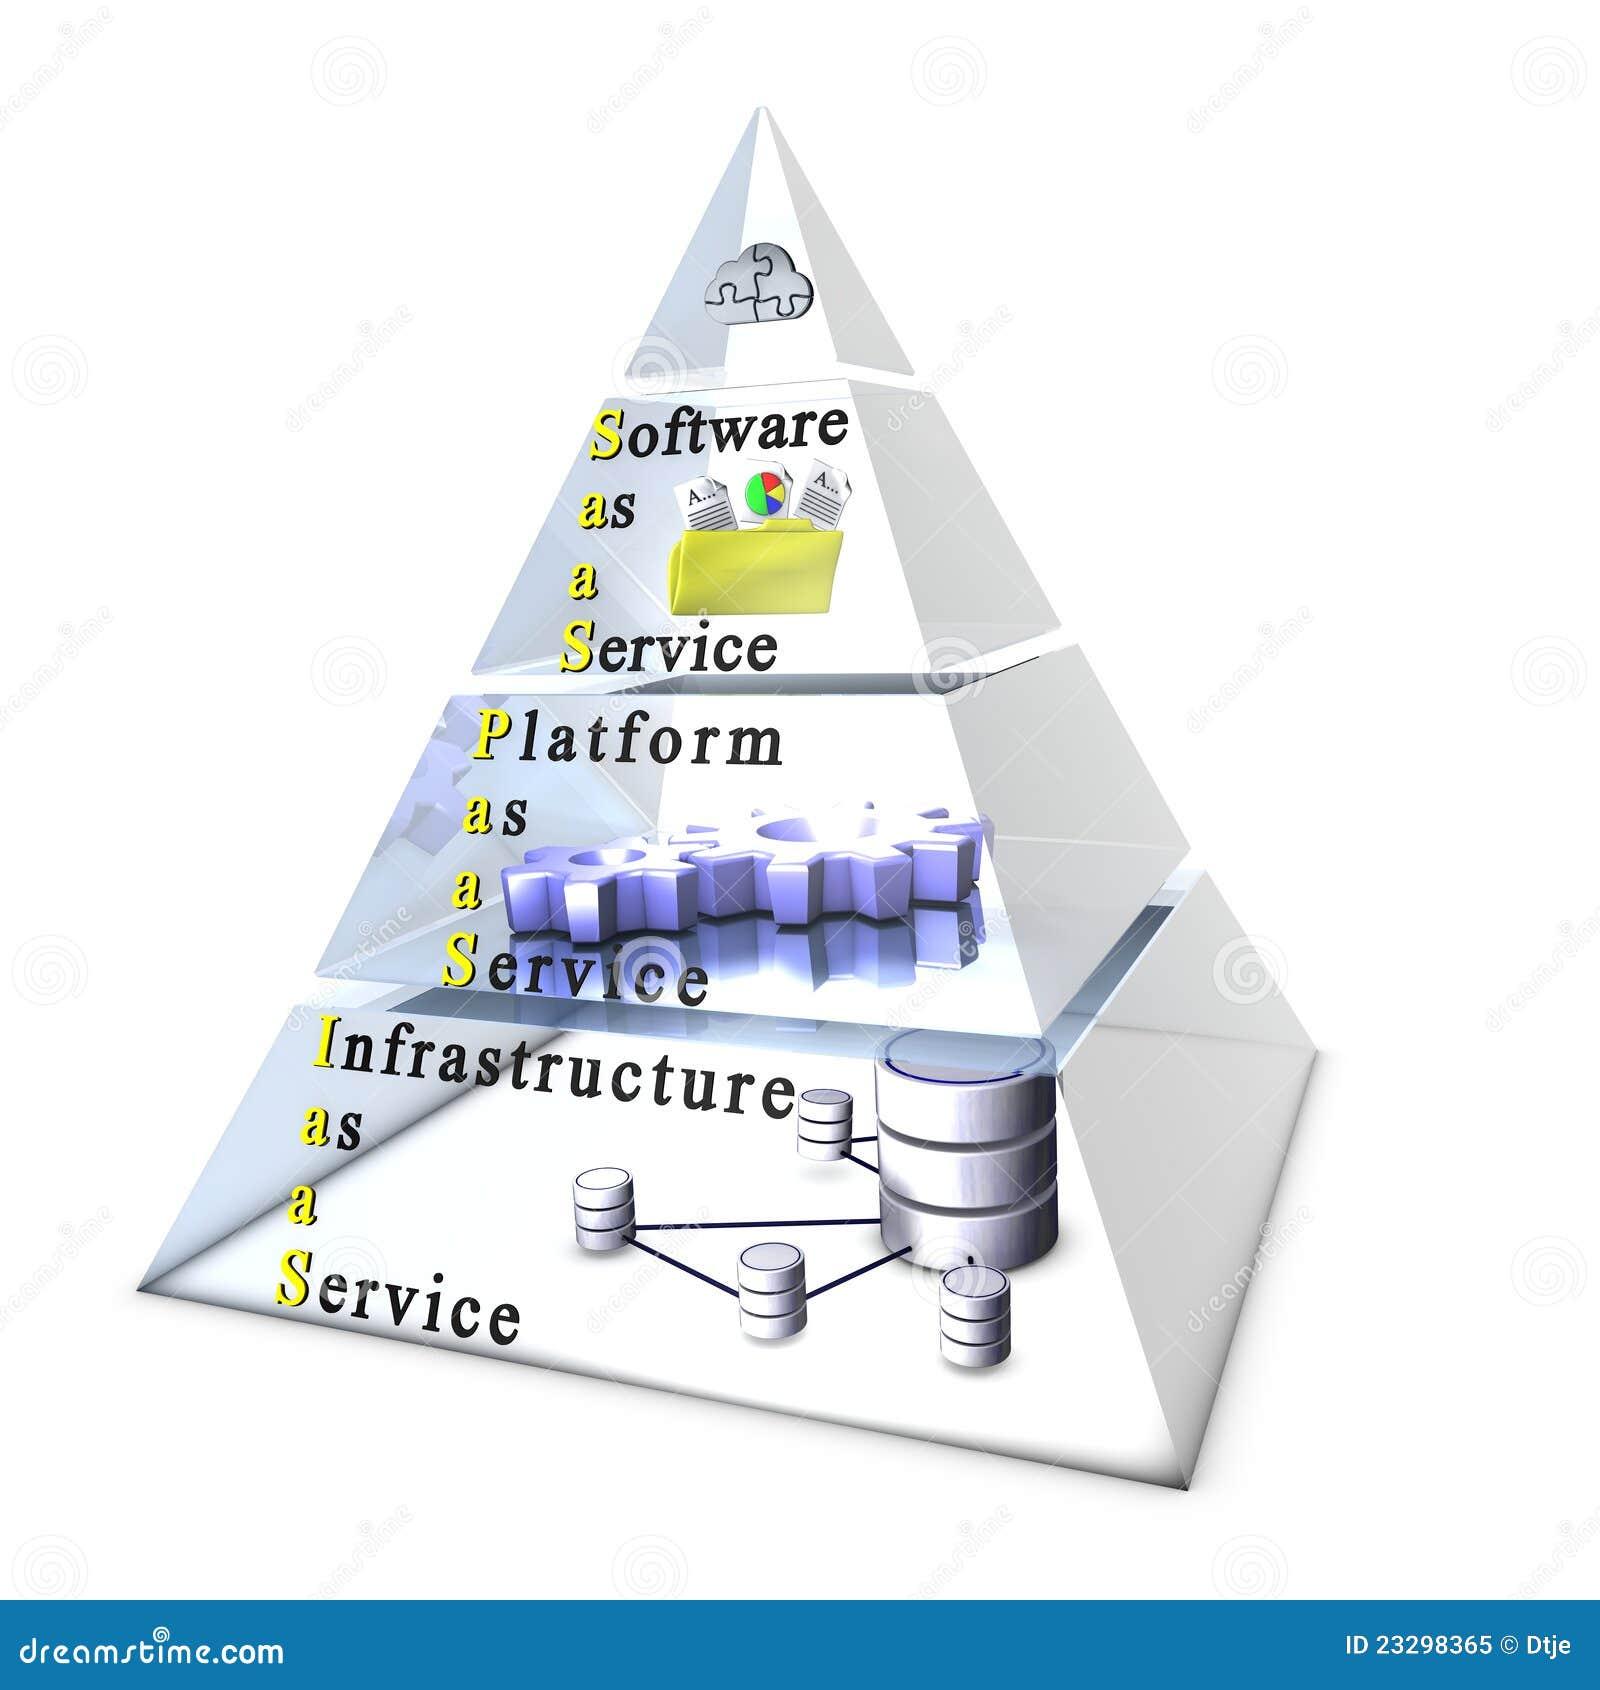 Software, Plattform, Infrastruktur als Service